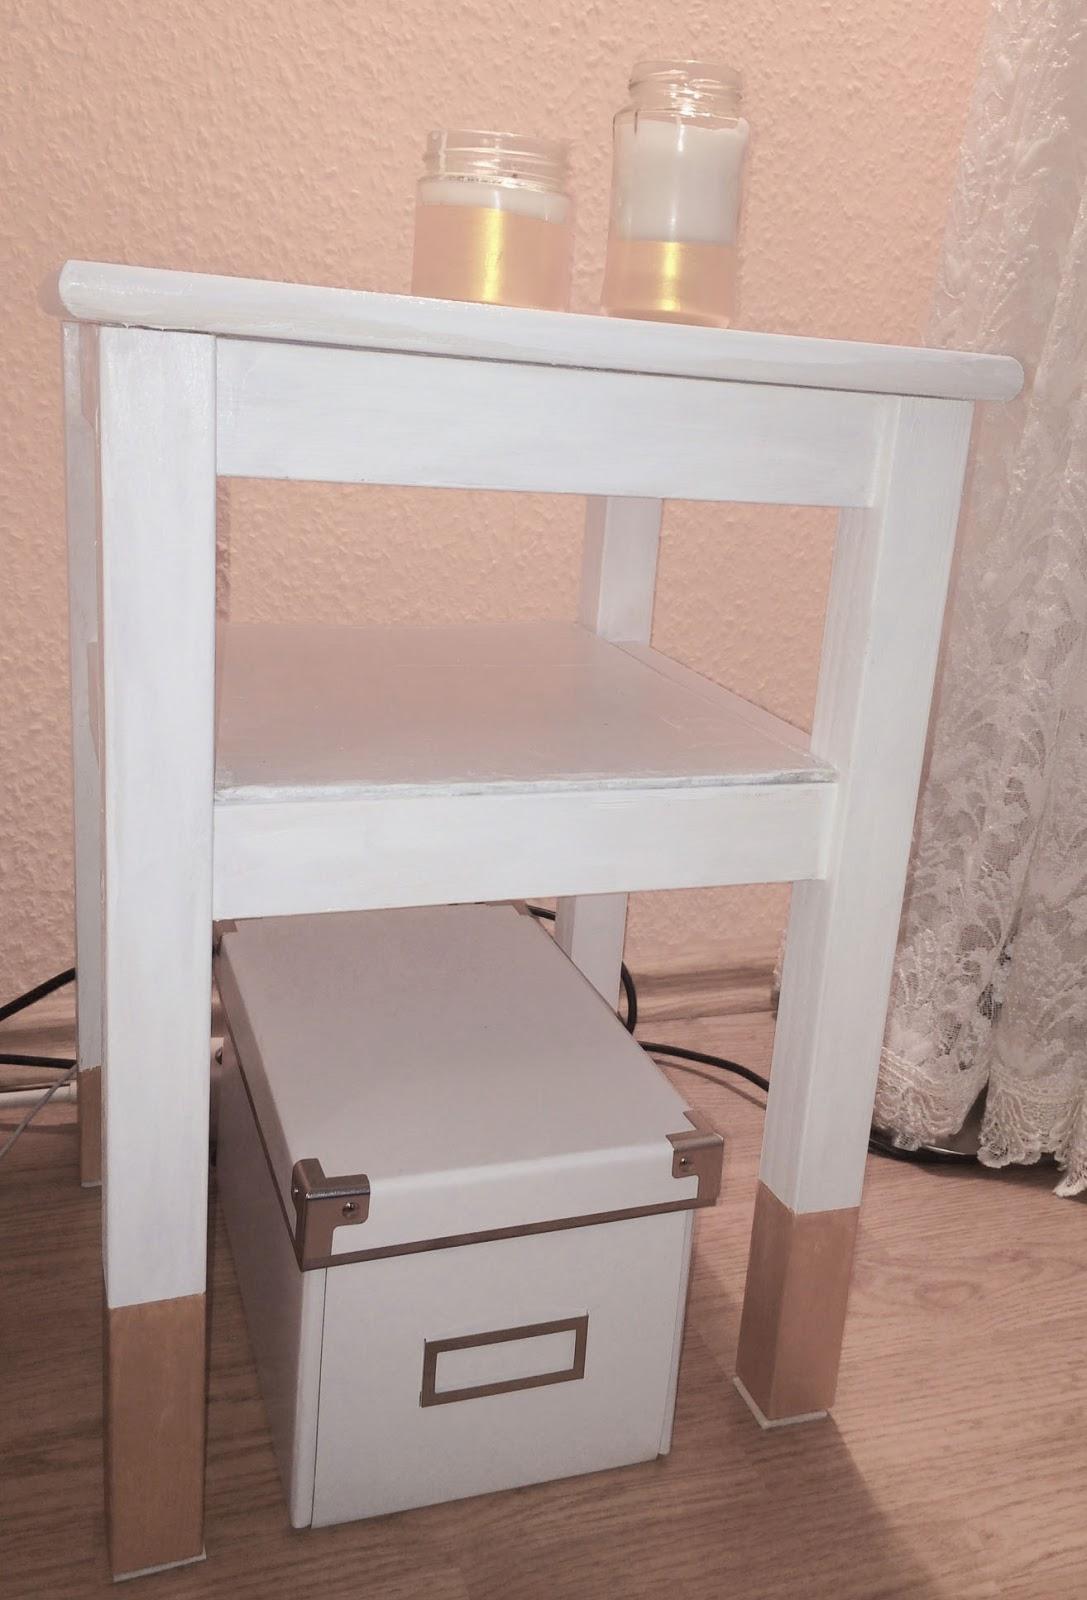 ars textura diy nachttisch ikea hack. Black Bedroom Furniture Sets. Home Design Ideas